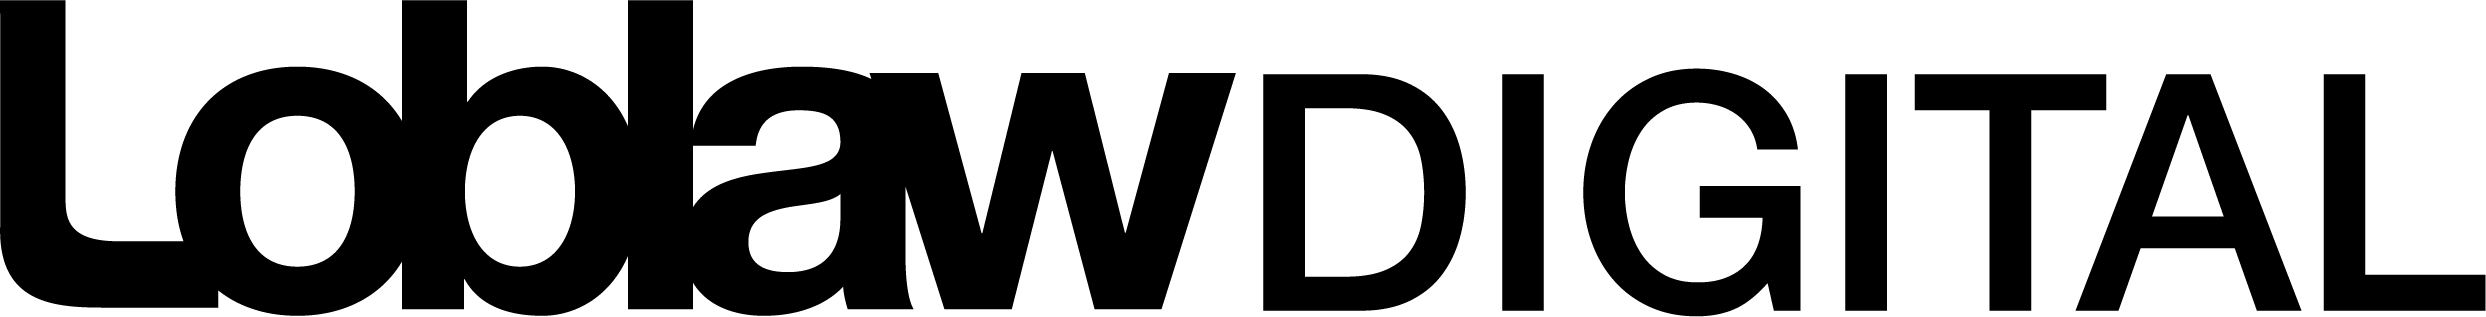 Logotipo da Loblaw Digital